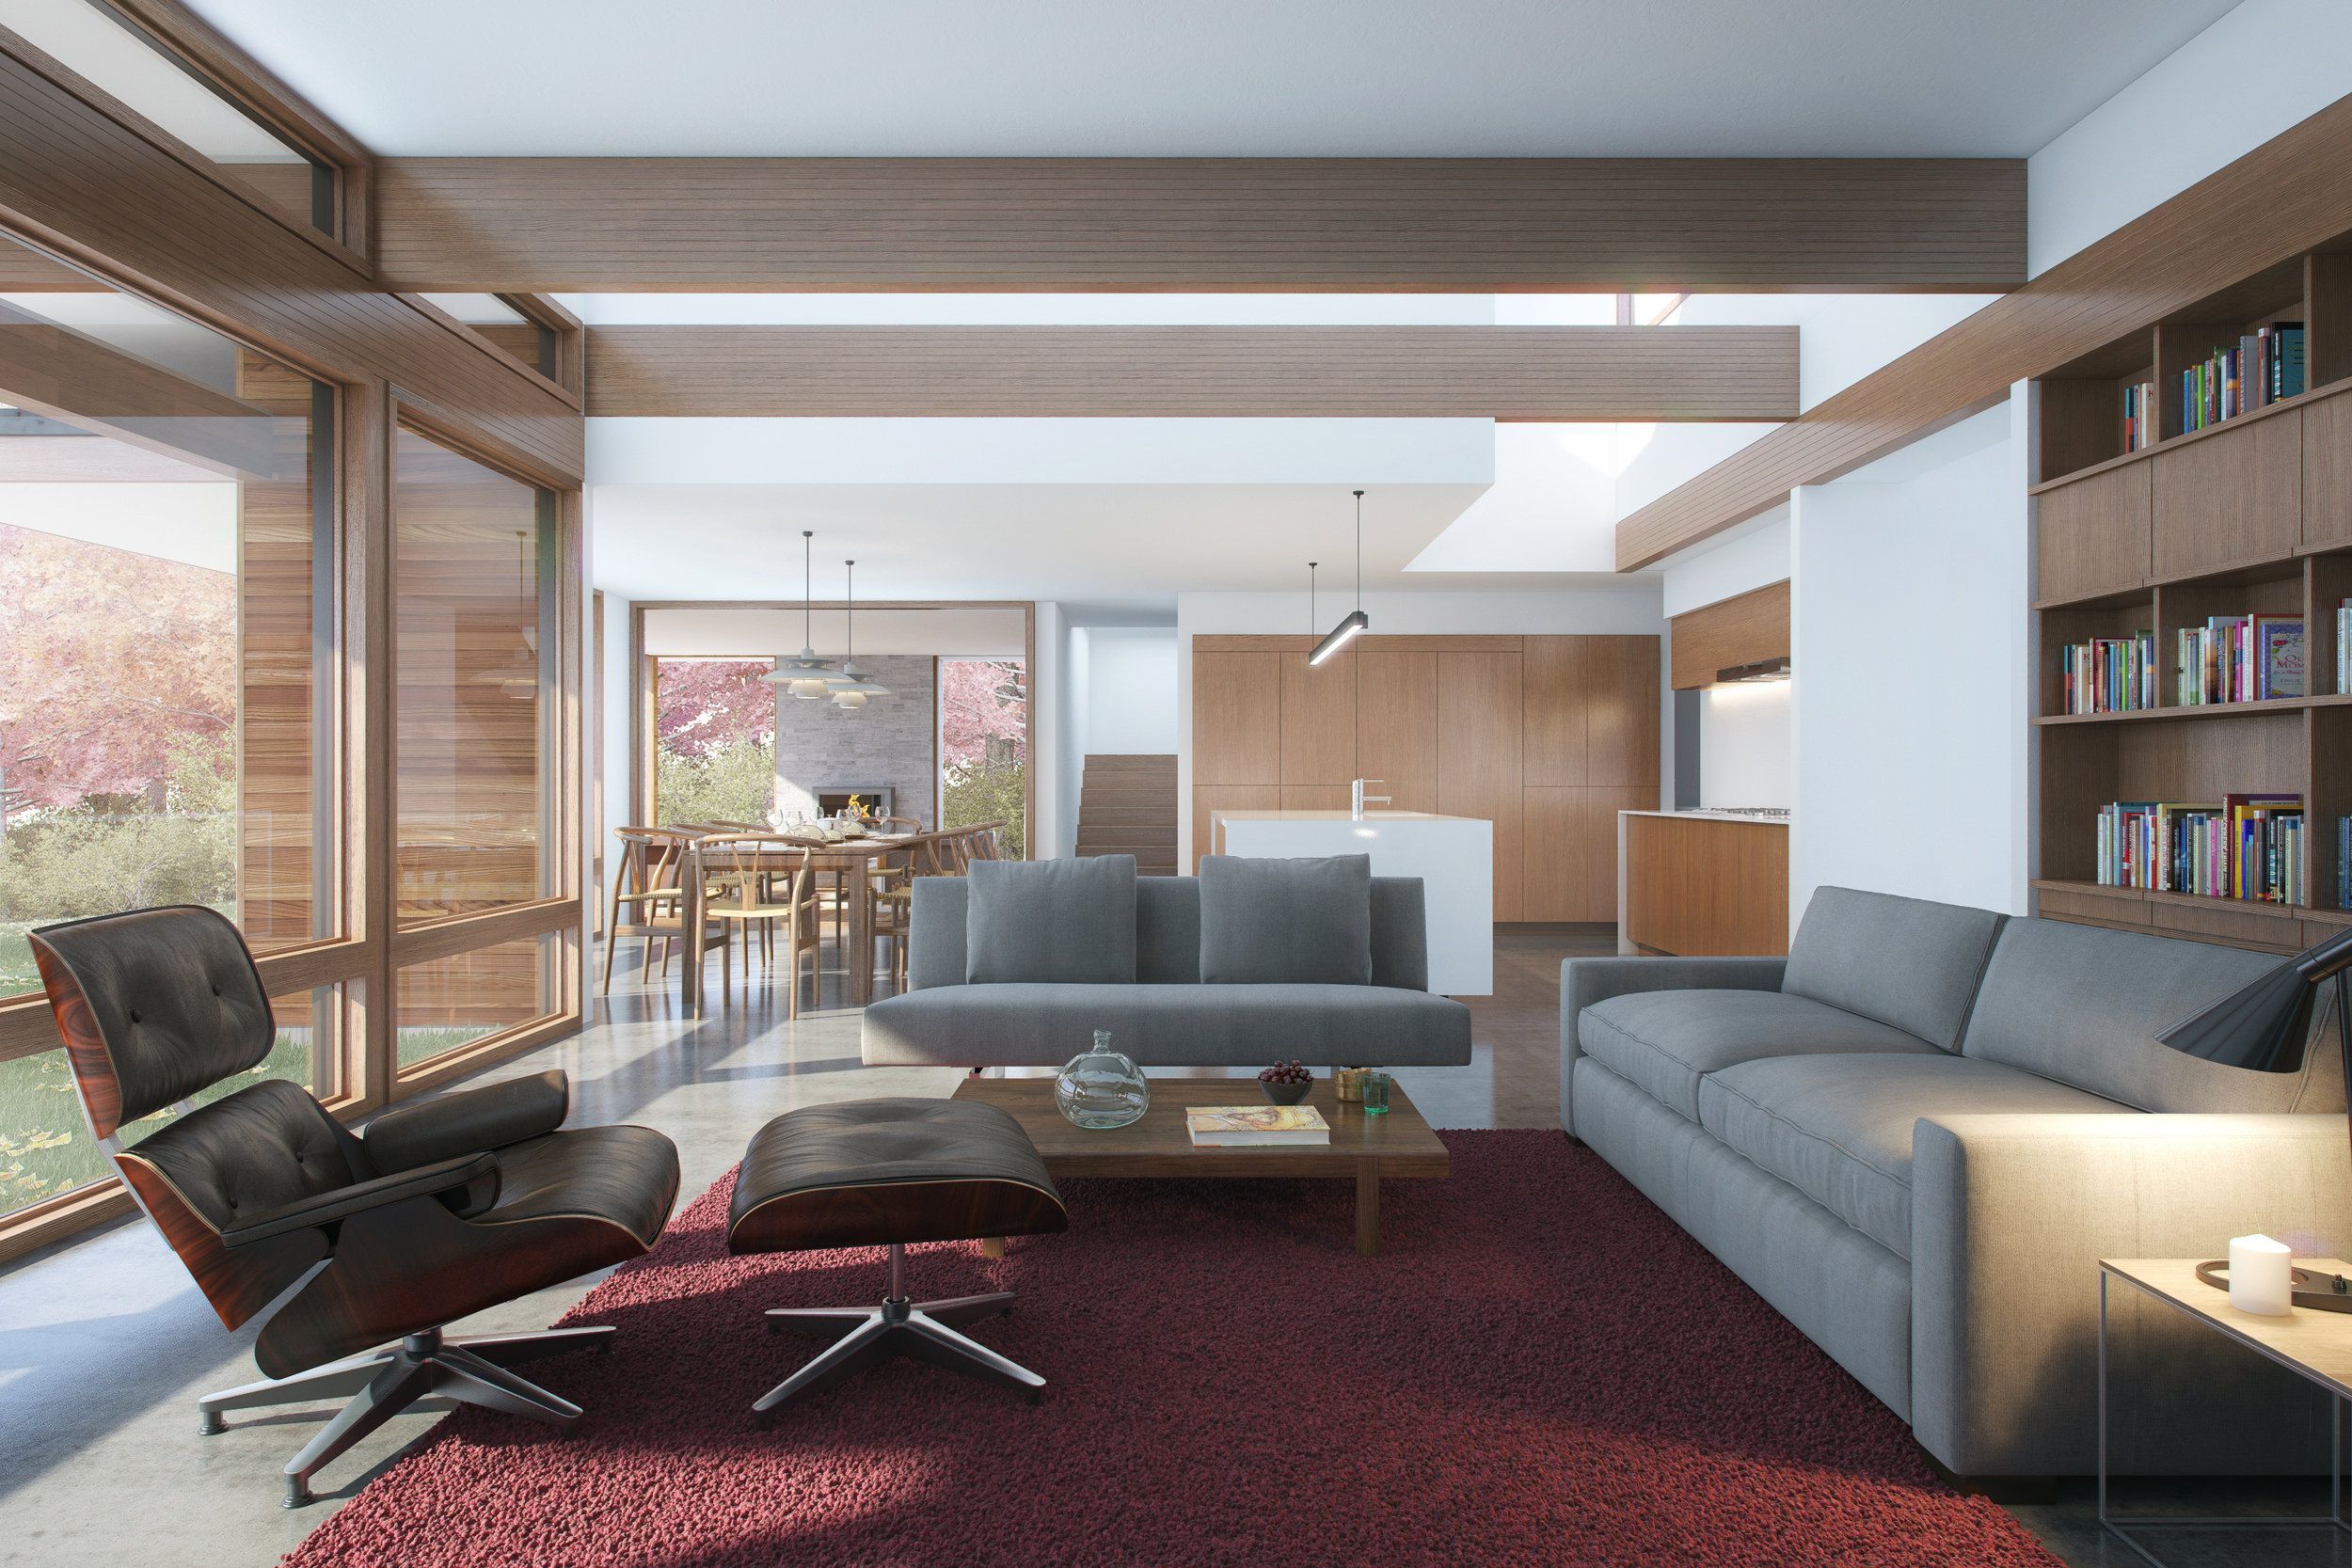 turkel_design_modern_prefab_home_axiom_series_axiom2450_interior_rendering.jpg